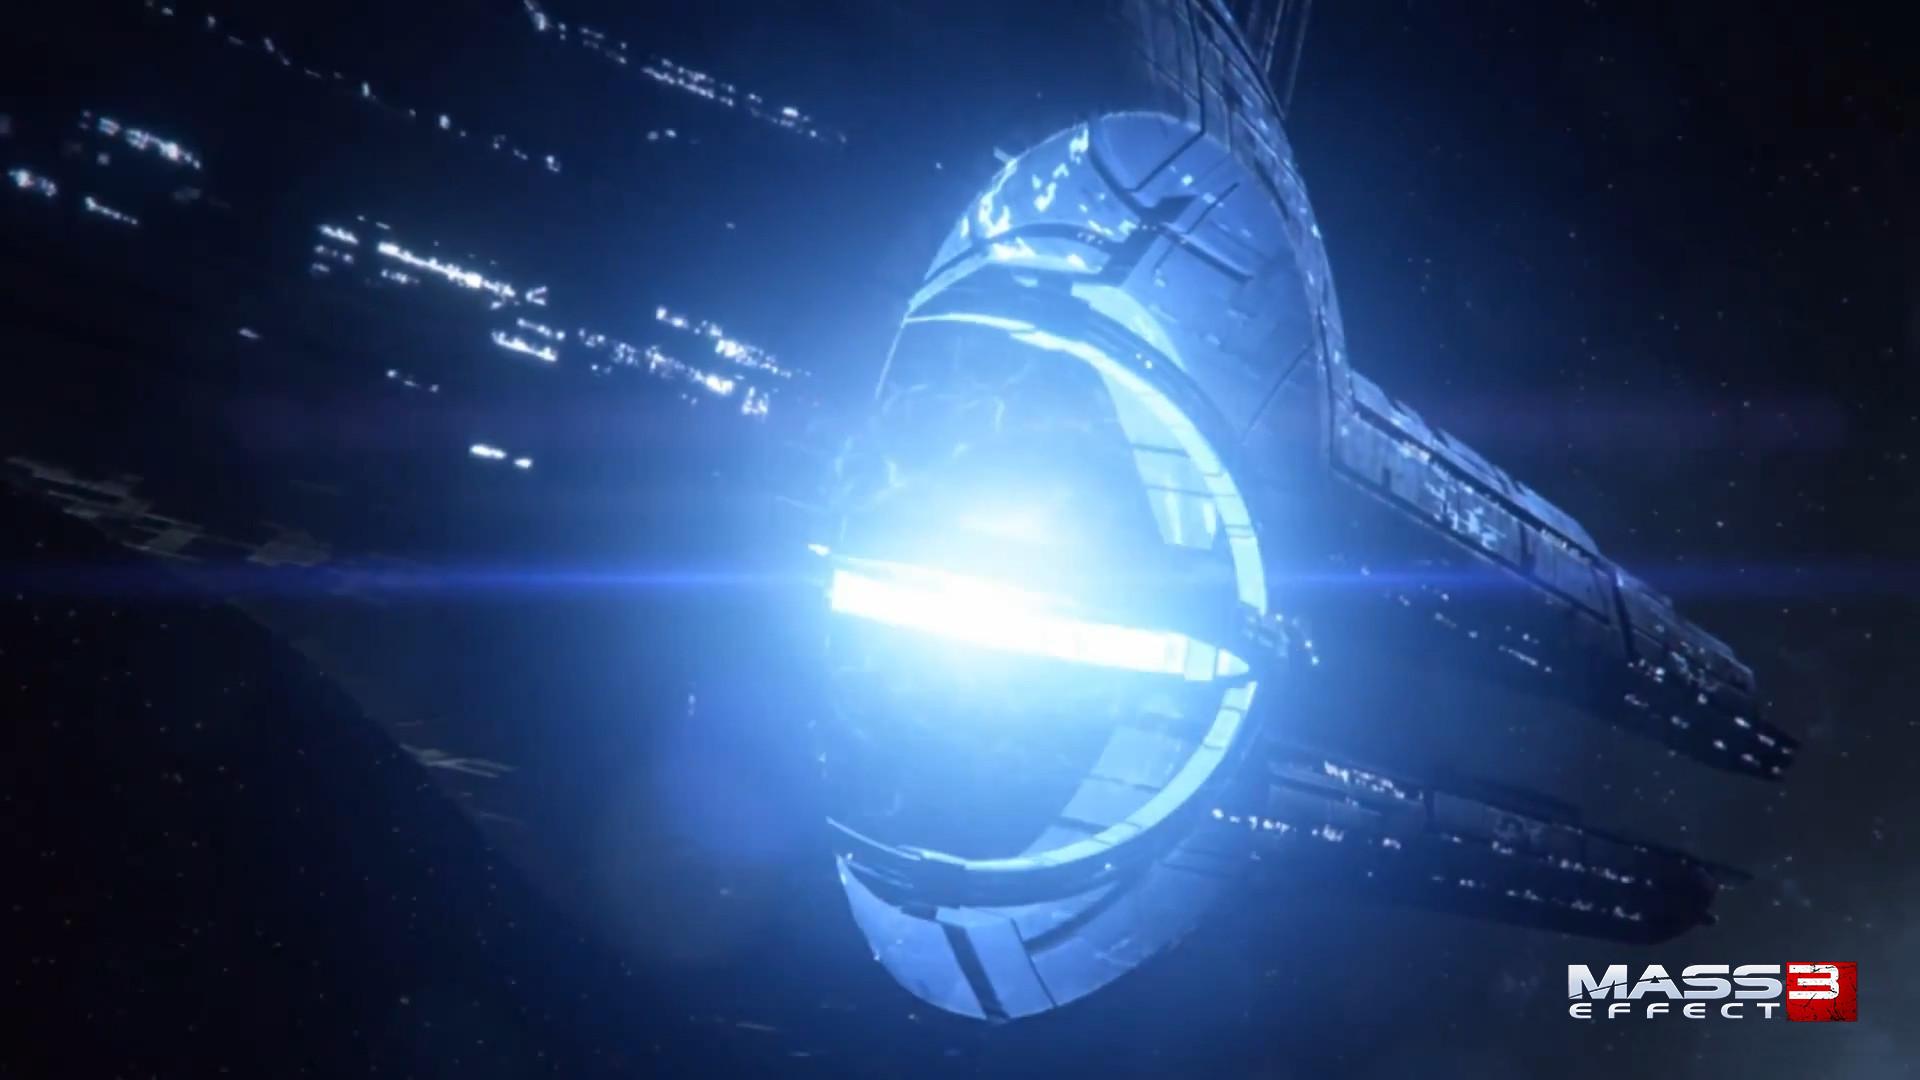 Mass Effect Animated Wallpaper